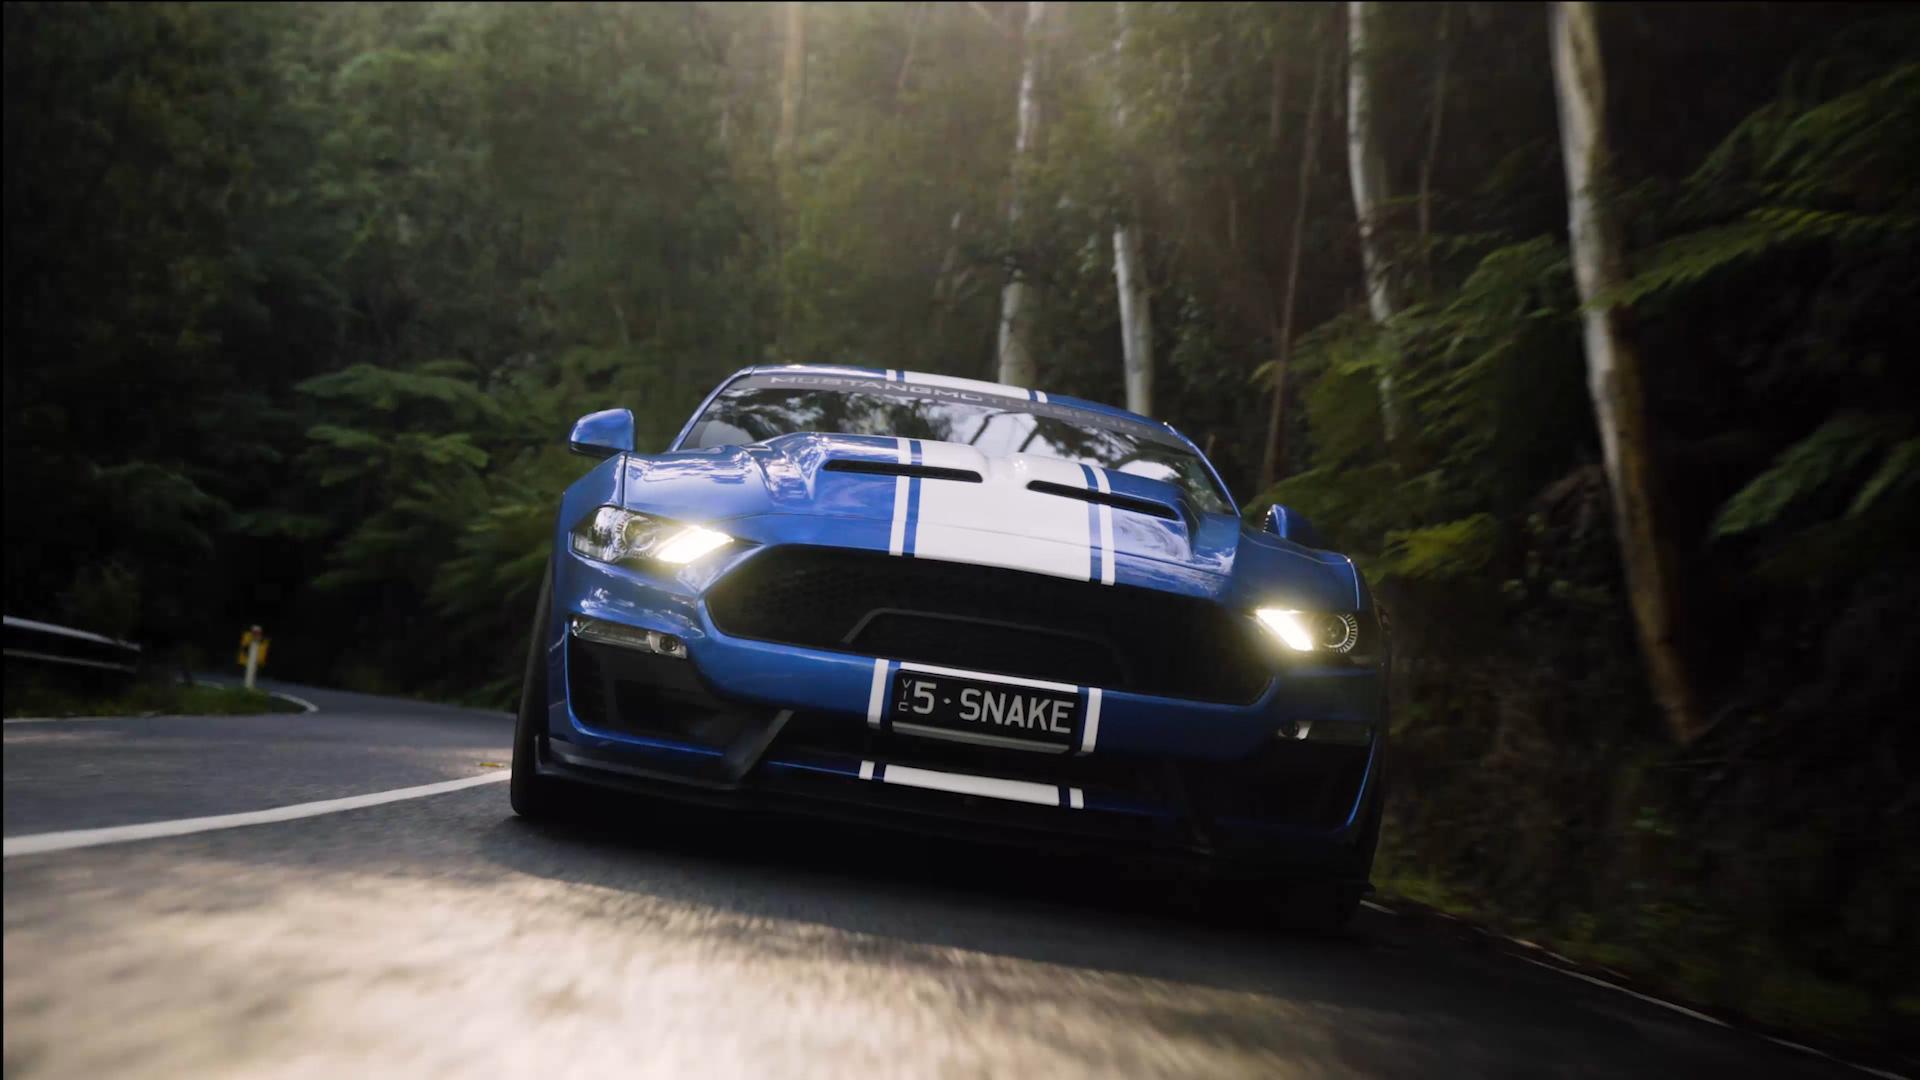 Mustang-Motorsport-Shelby-Supersnake